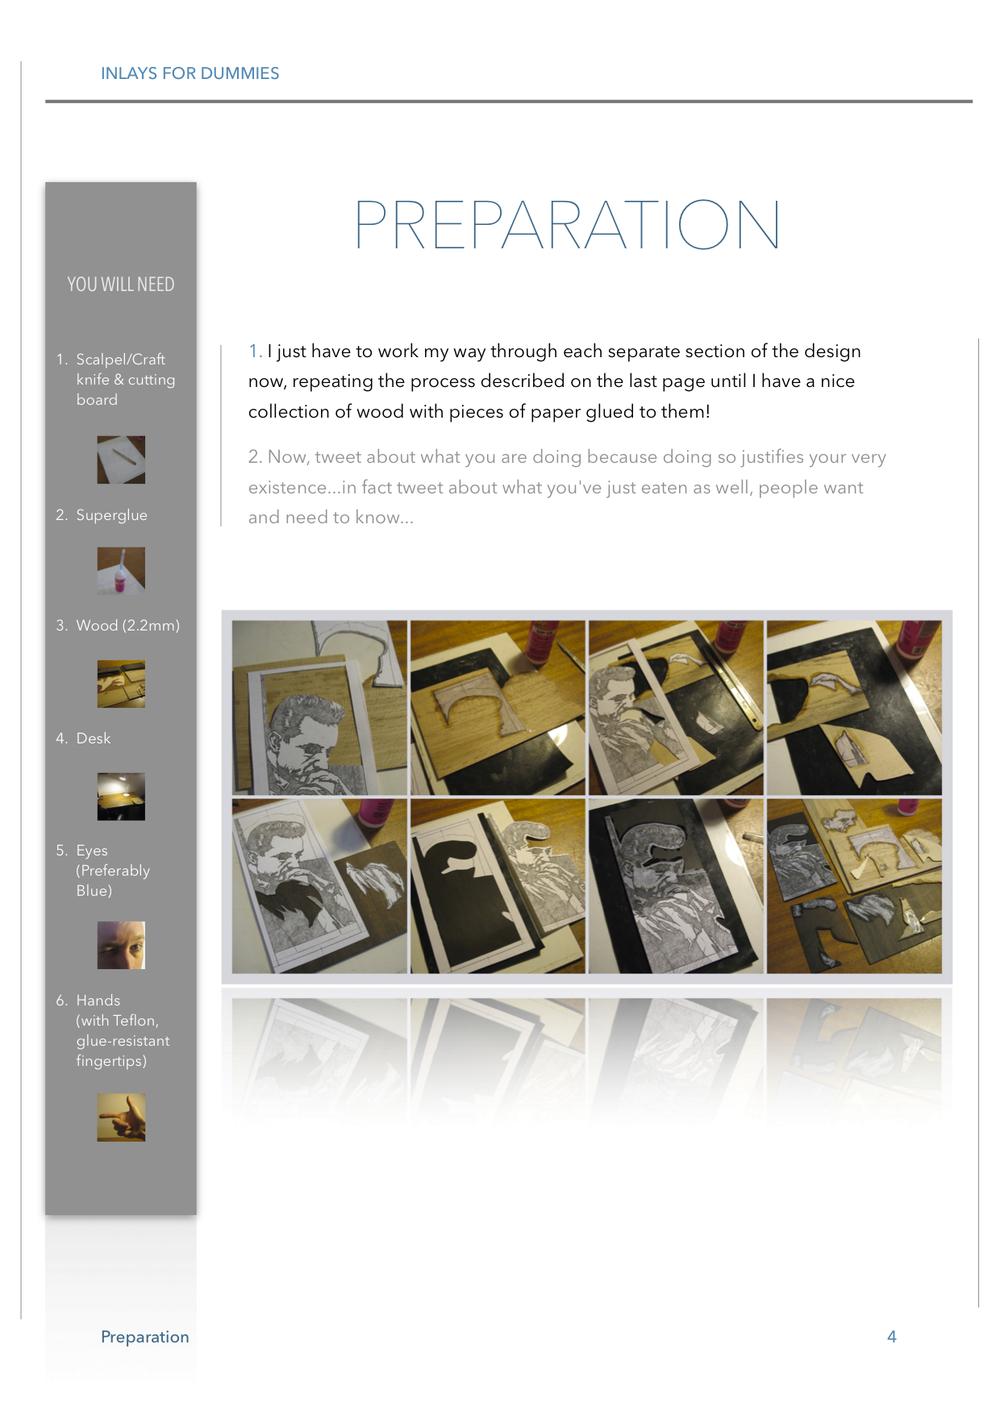 4 PREPARATION